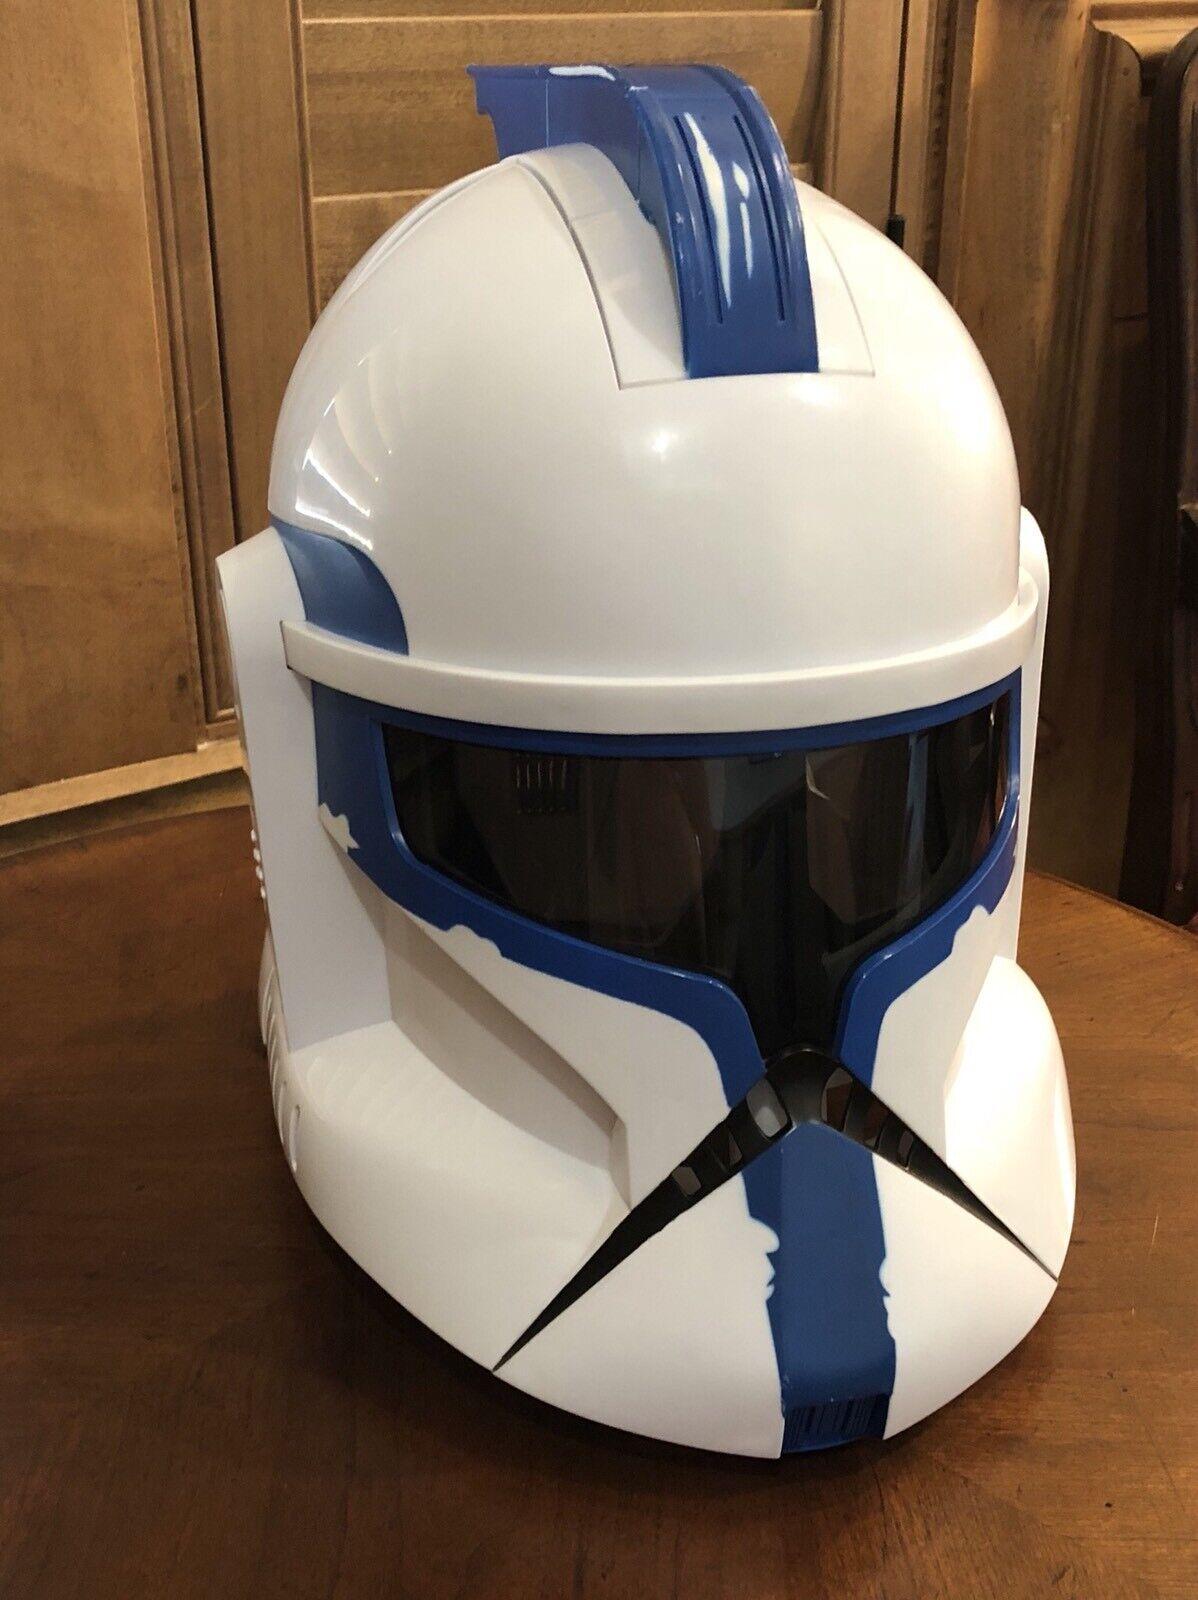 Vintage Star Wars 501st Clone Trooper Voice Changer Helmet Wal-Mart Exclusive